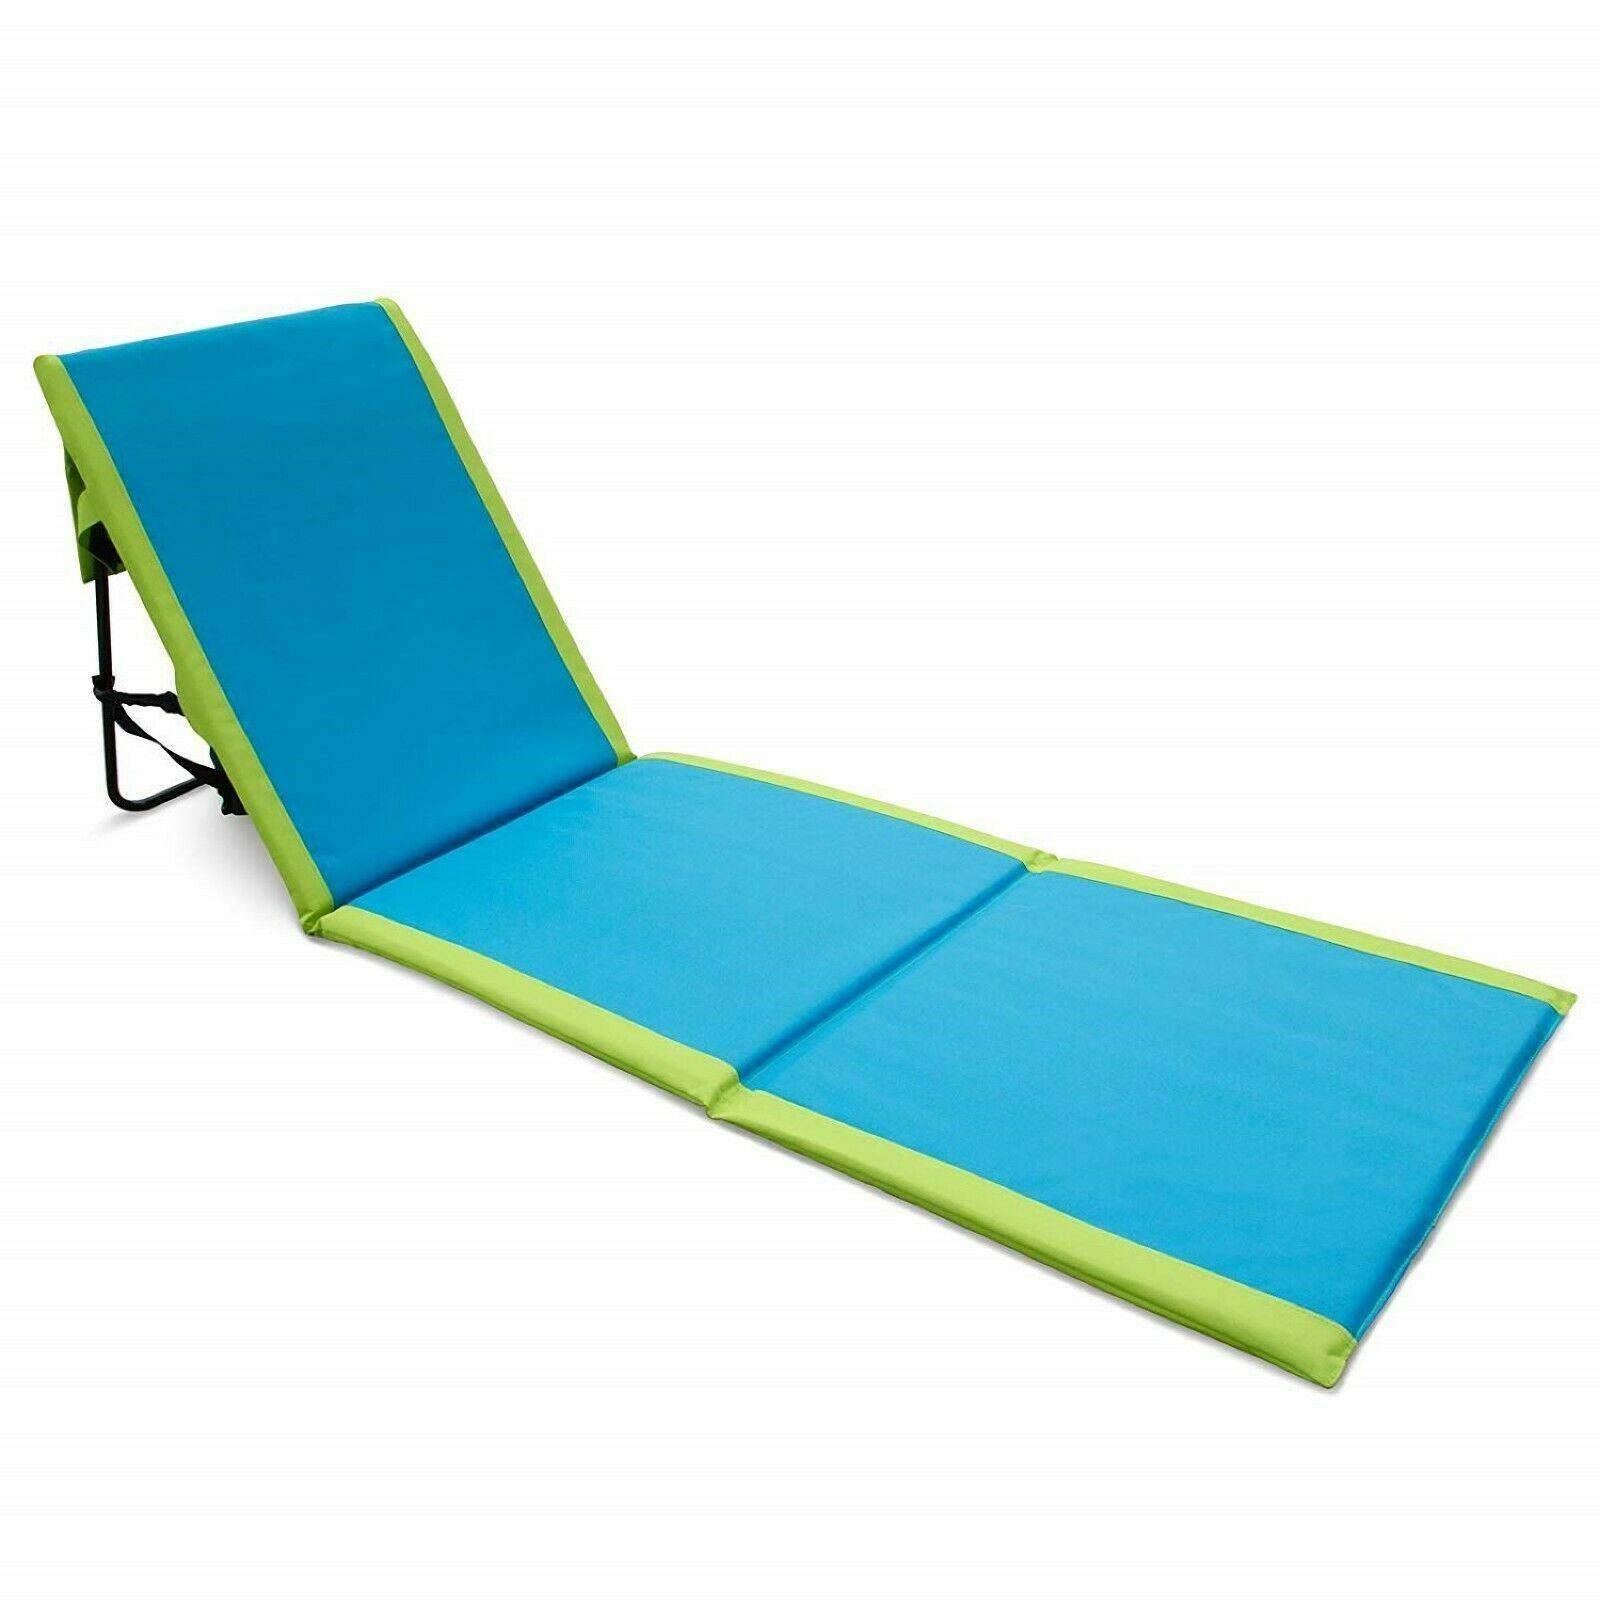 Beach Lounge Chair Portable Ocean Sand Mat Camping Sleeping Sunbathing Backpack